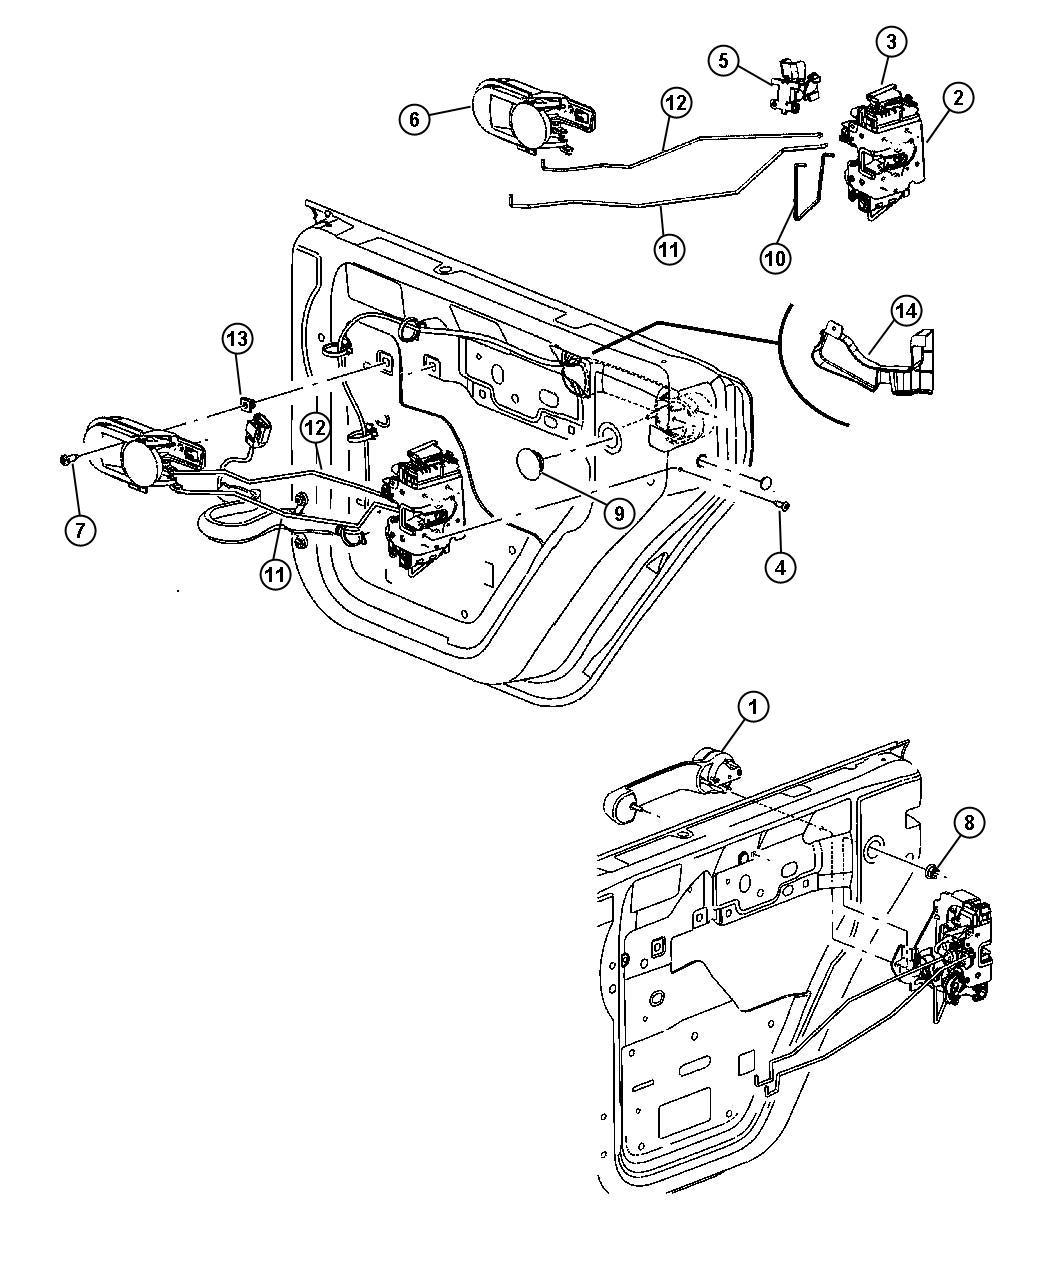 2010 Jeep Wrangler Latch. Rear door. Right. Manual, locks